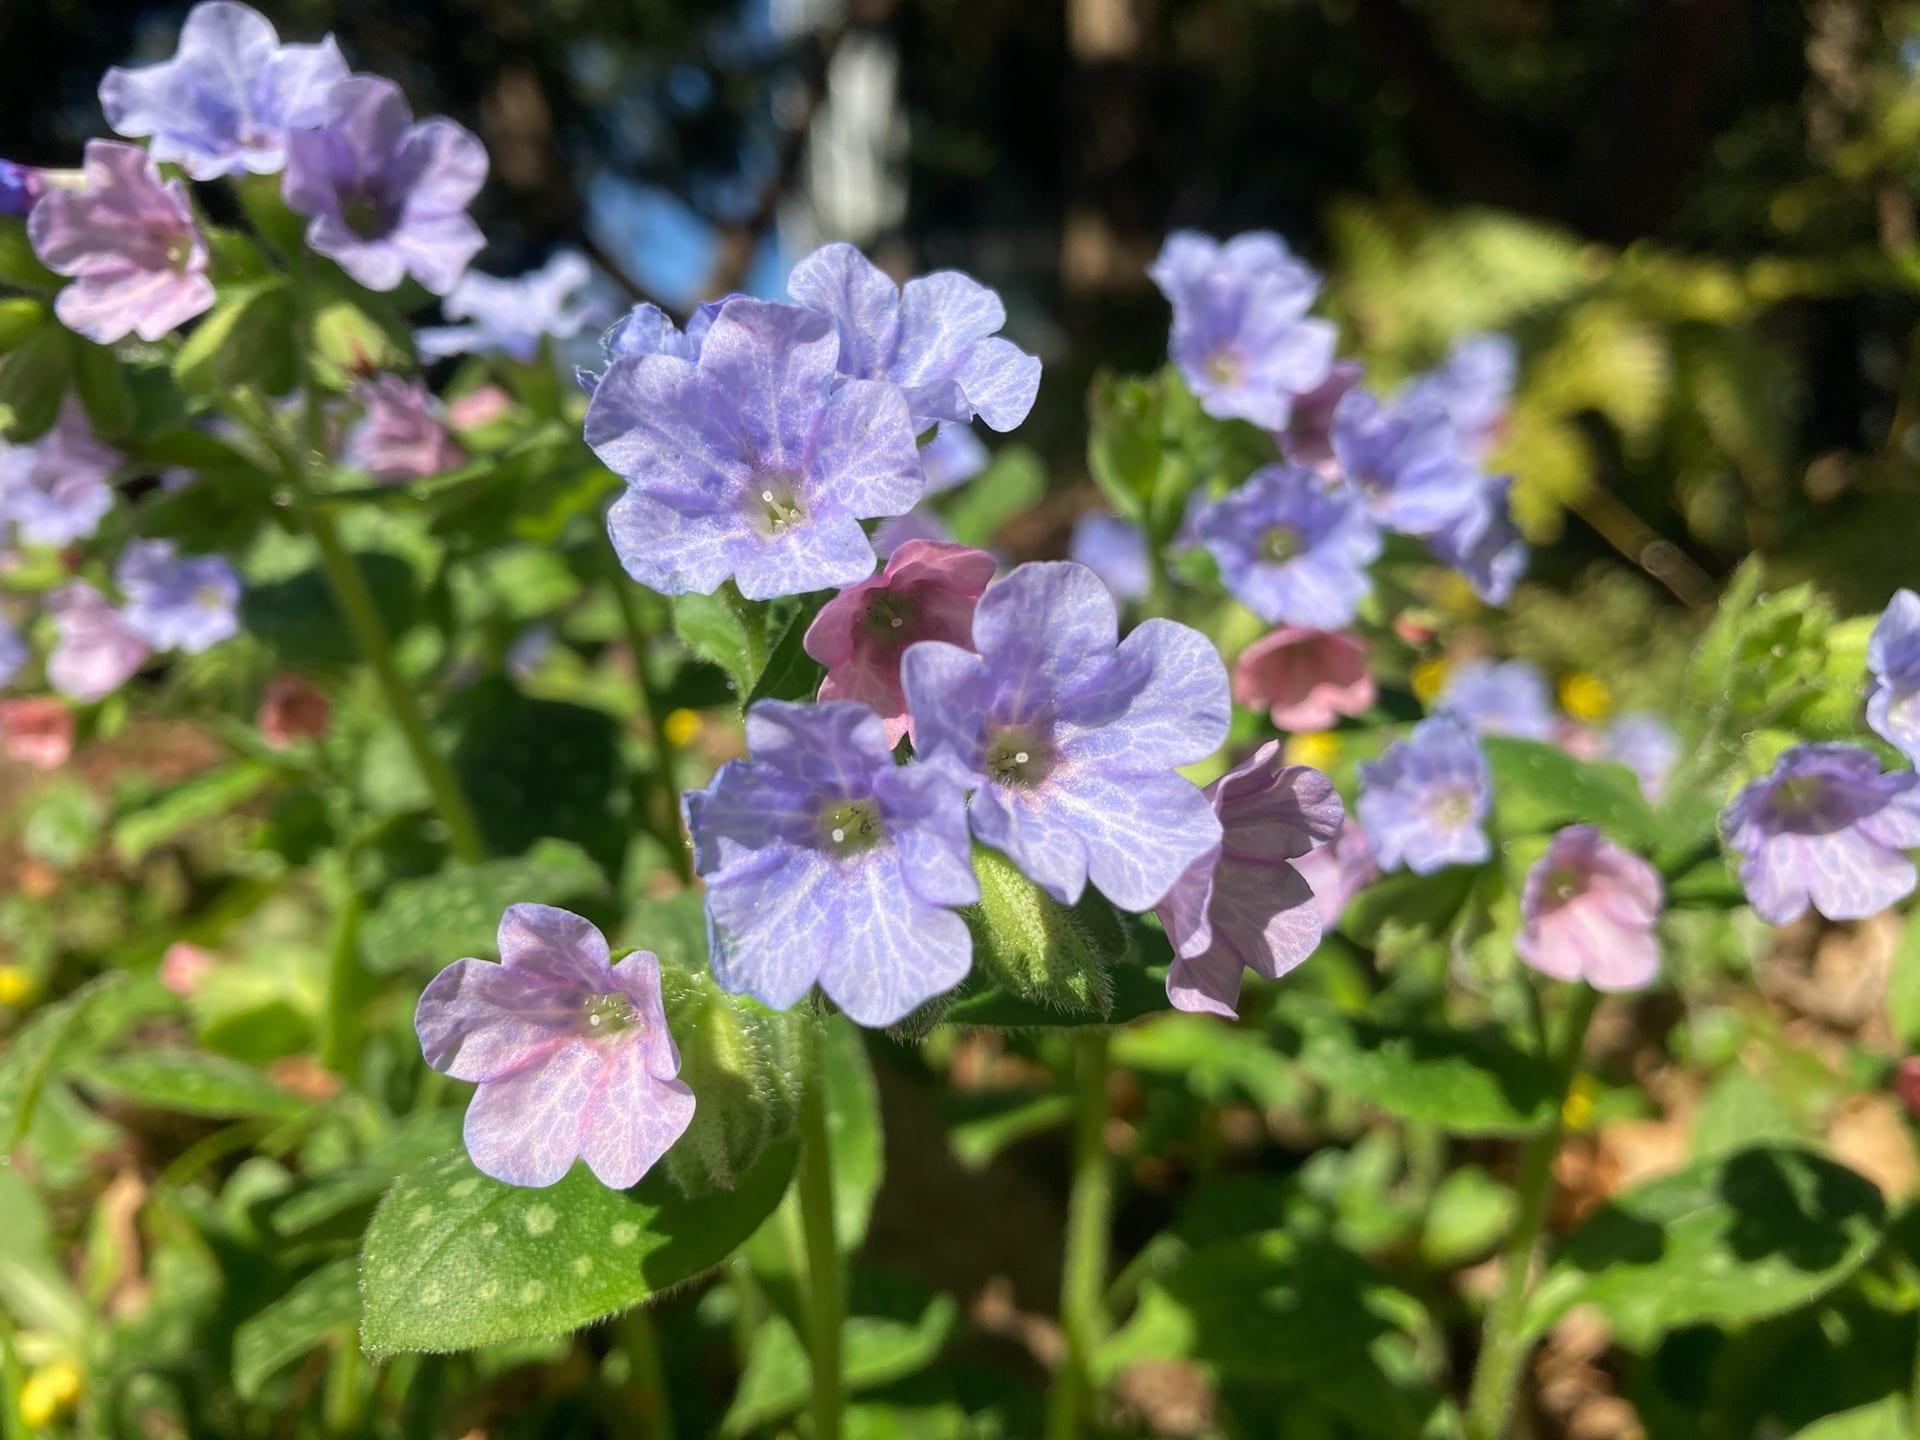 Pulmonaria cv. blooms by the pond.